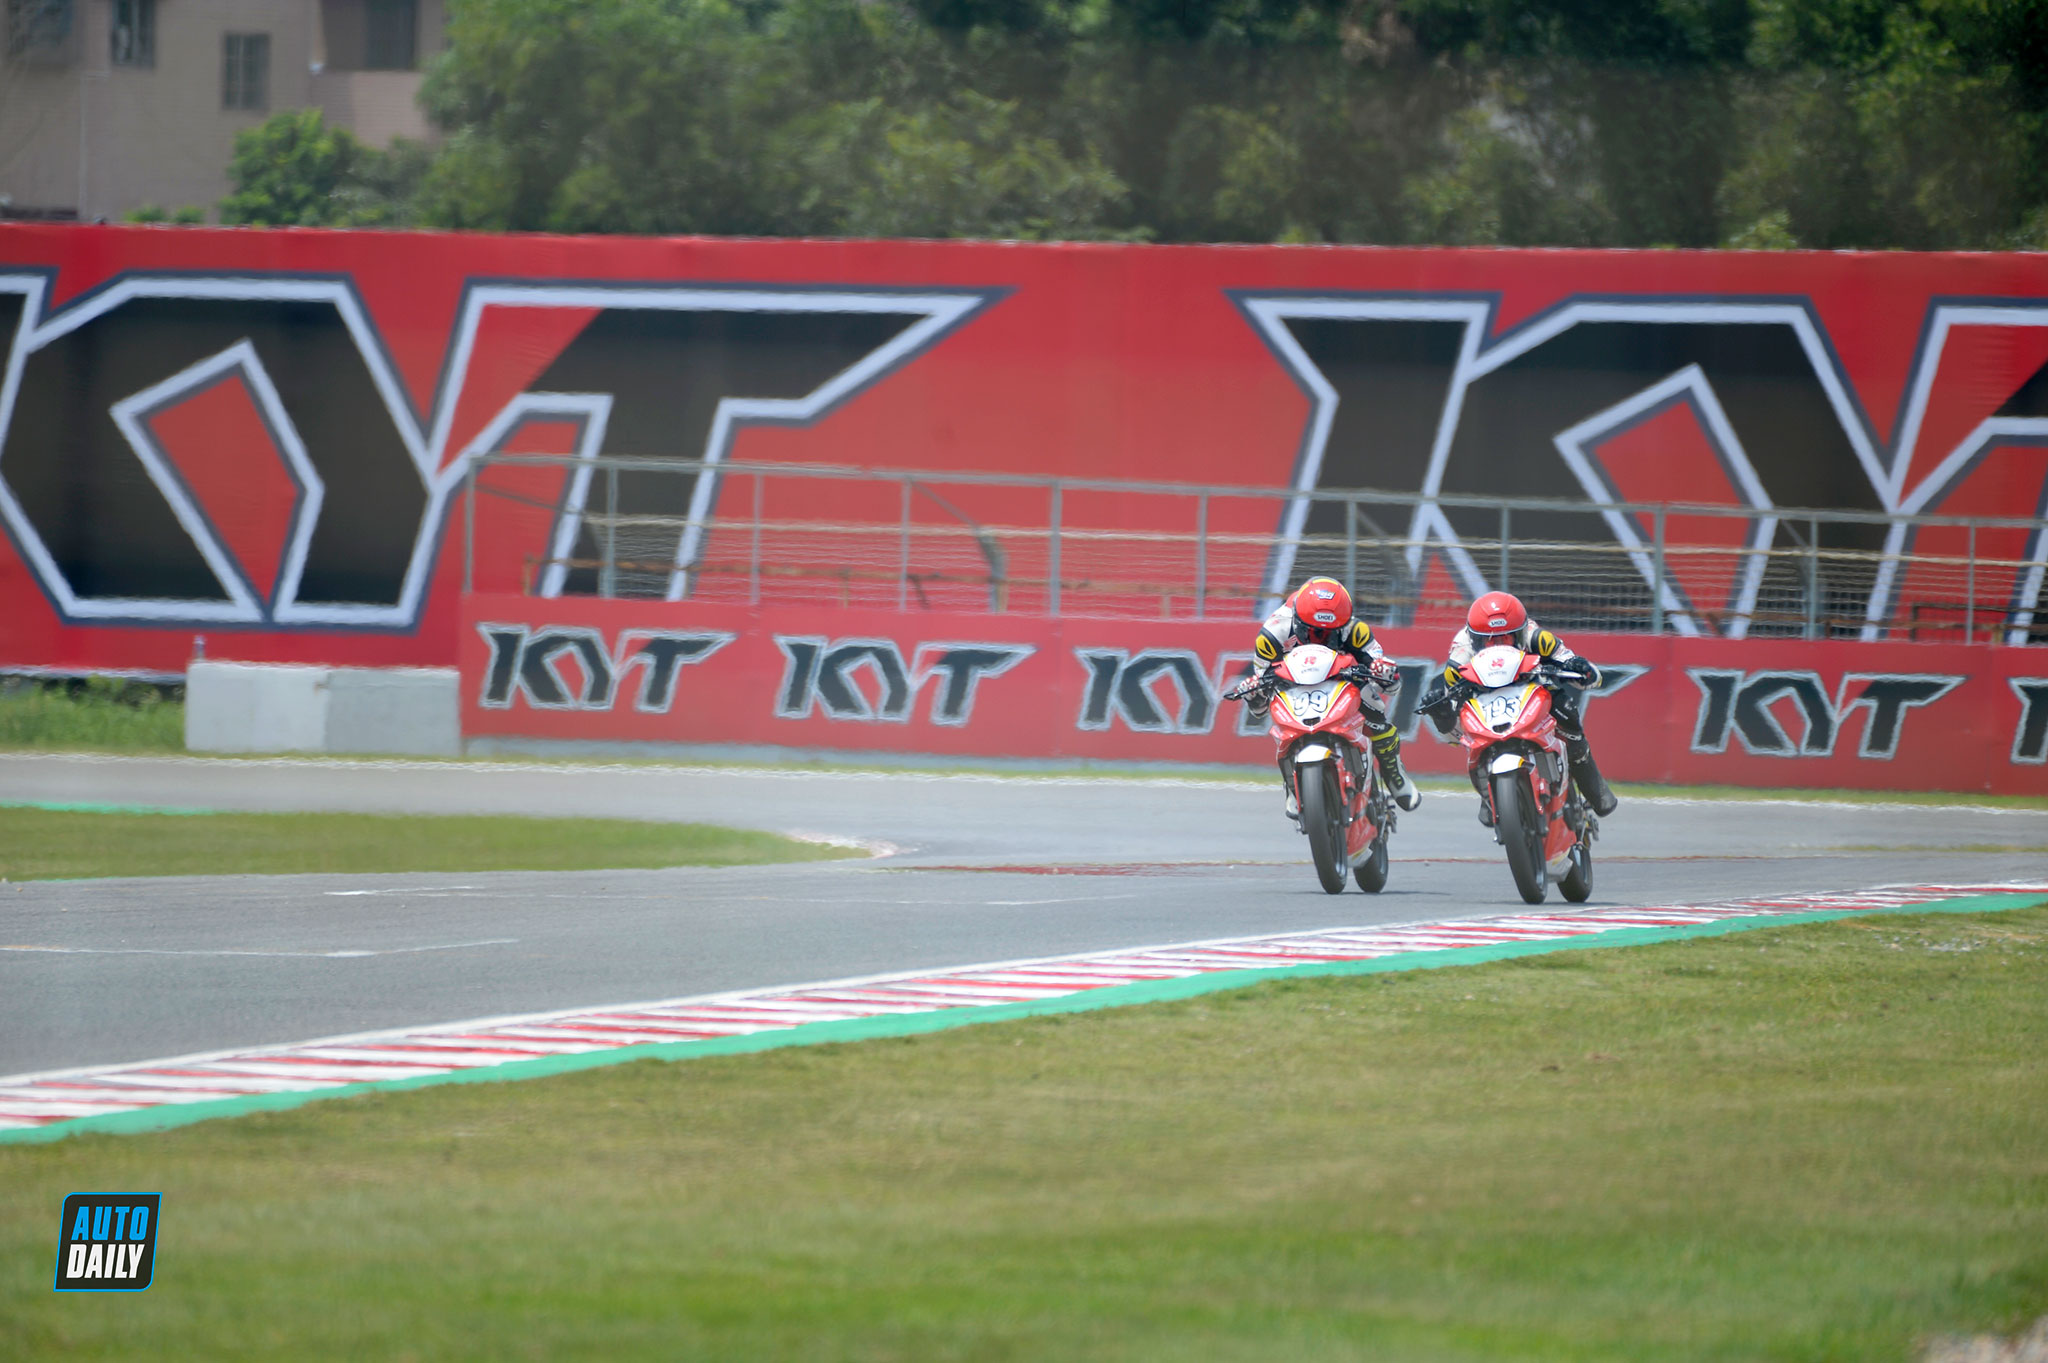 arrc-round5-race1-autodaily-09.jpg